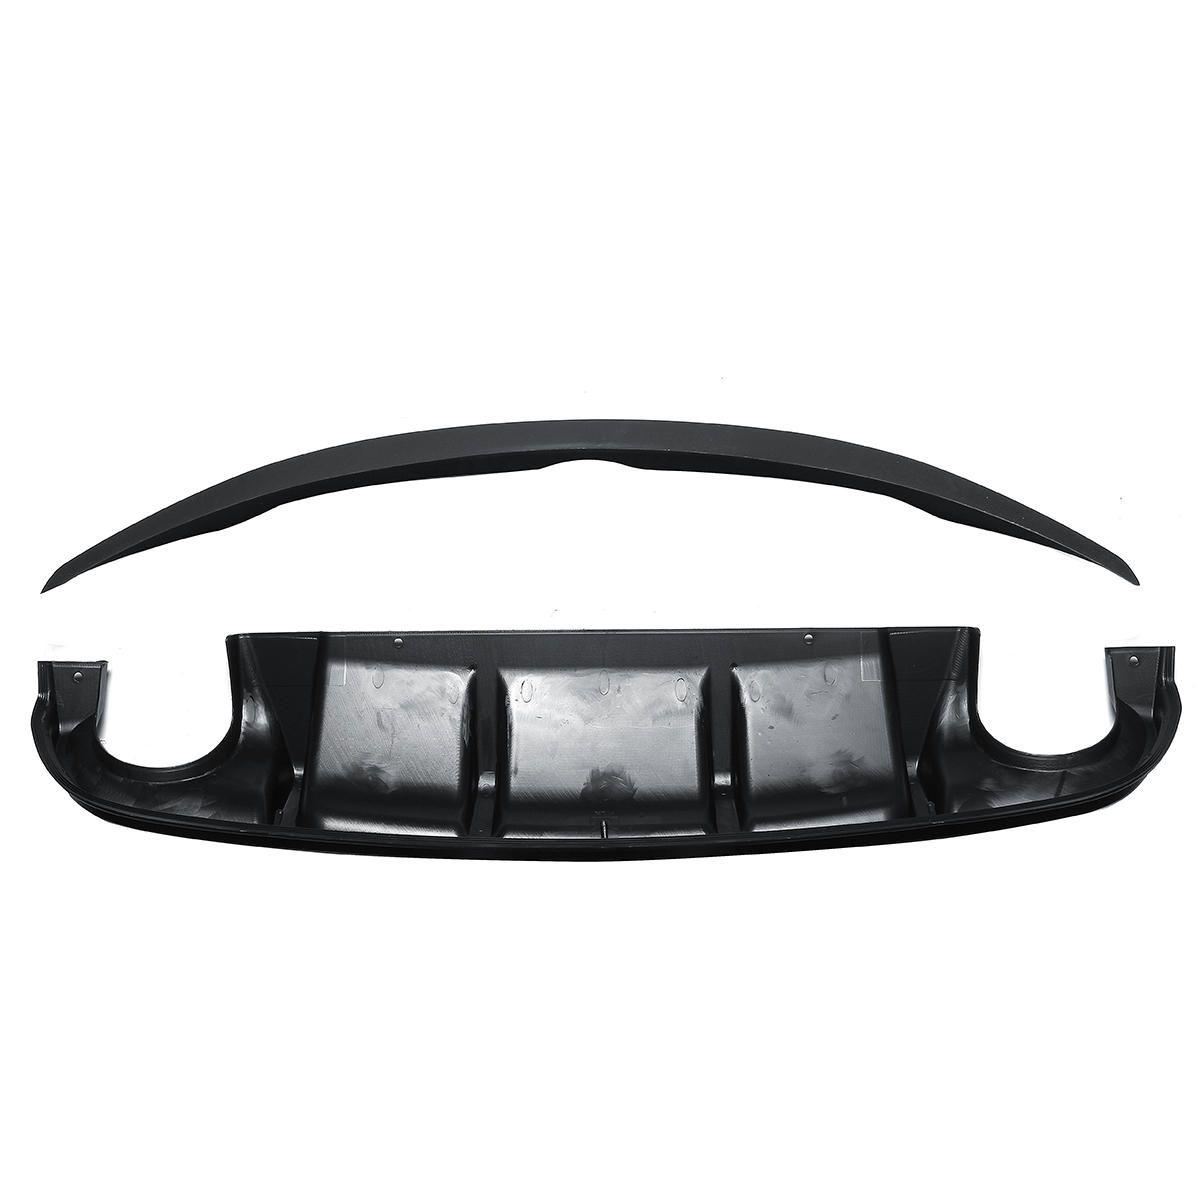 AQ Style Rear Bumper Diffuser & OE Style Trunk Spoiler For